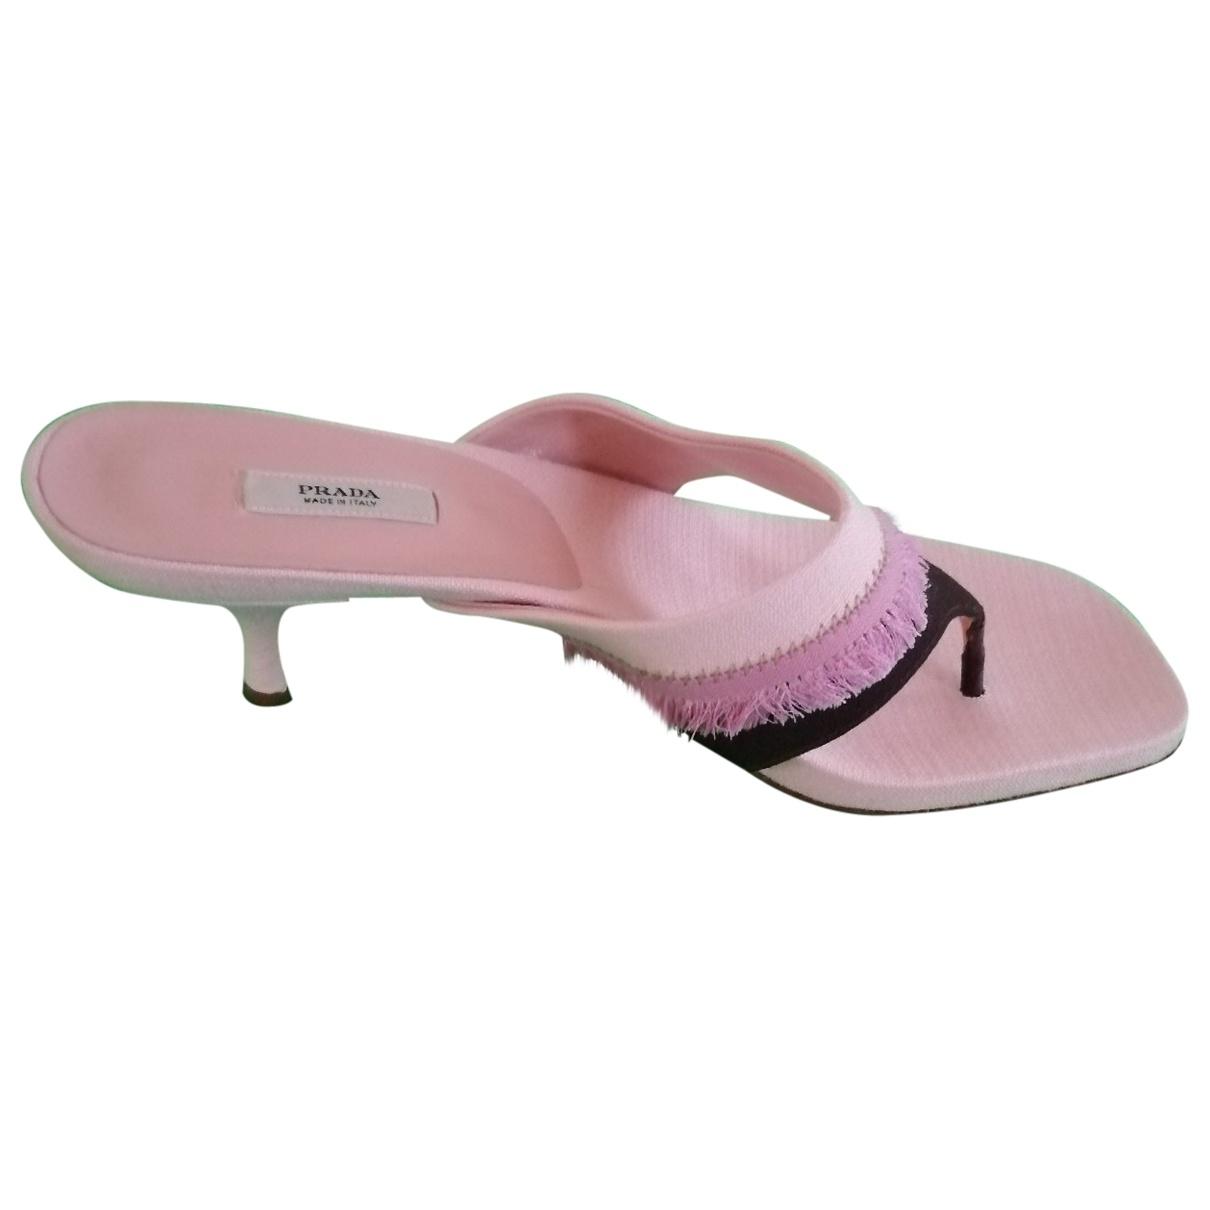 Prada - Sandales   pour femme en toile - rose